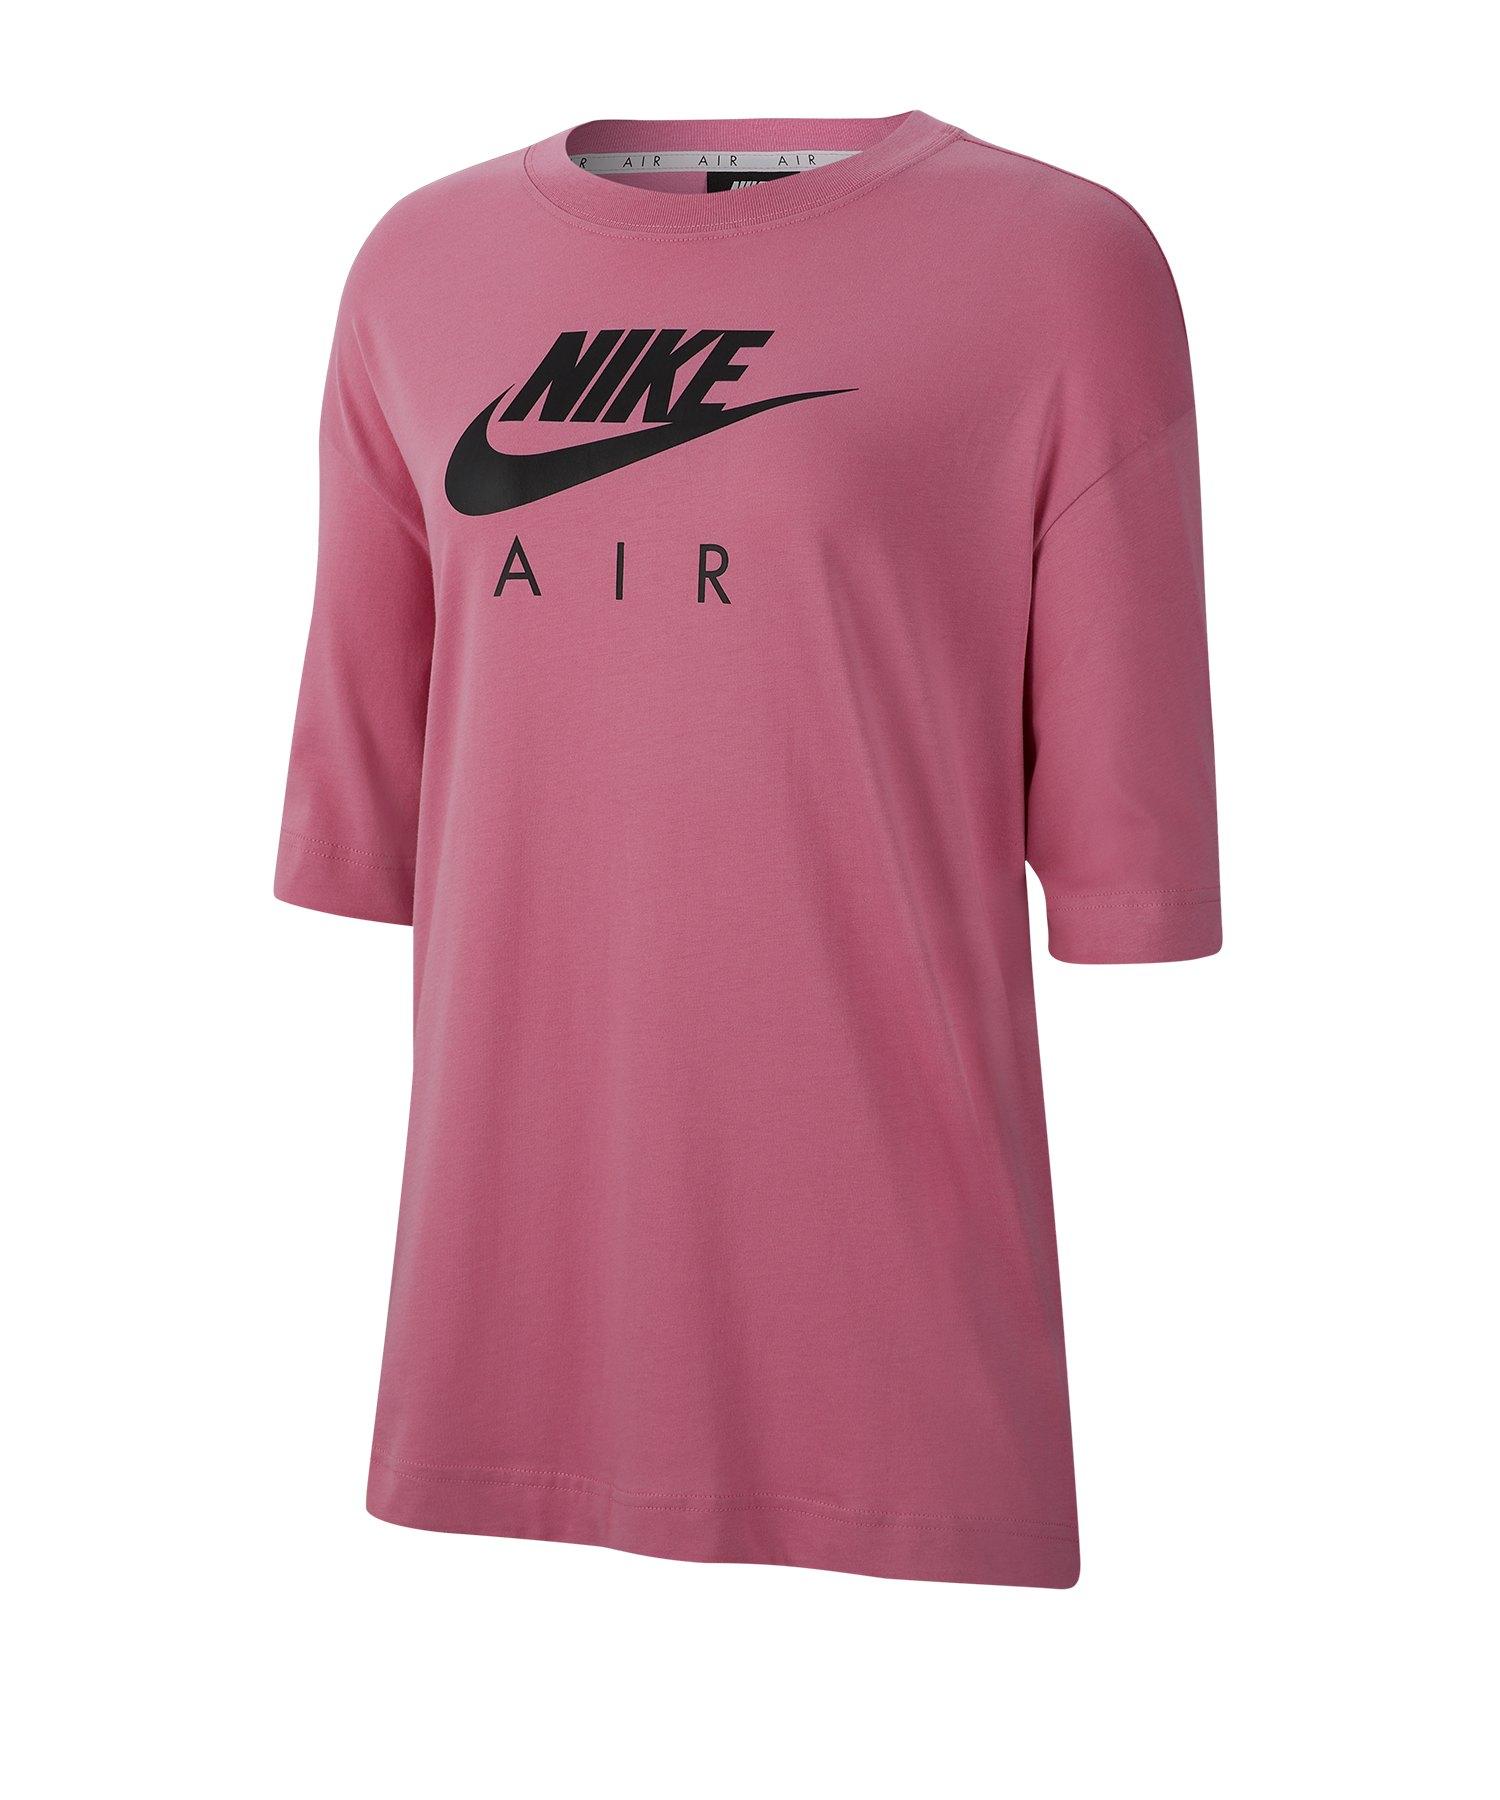 Nike Air T-Shirt Damen Rot F693 - rot